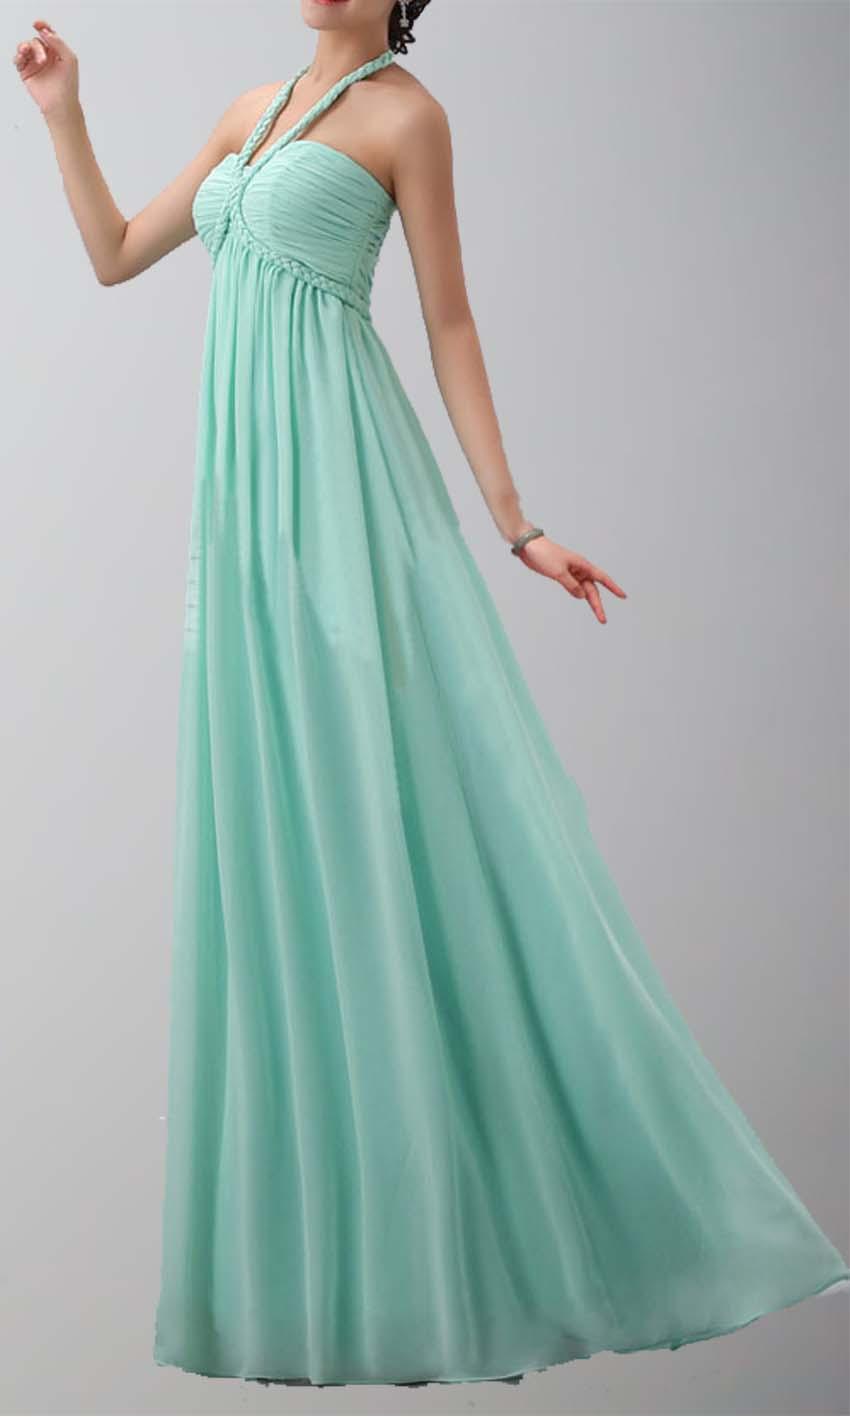 Halter Neck Long Chiffon Prom Dress , long Bridesmaid Dress ,simple ...